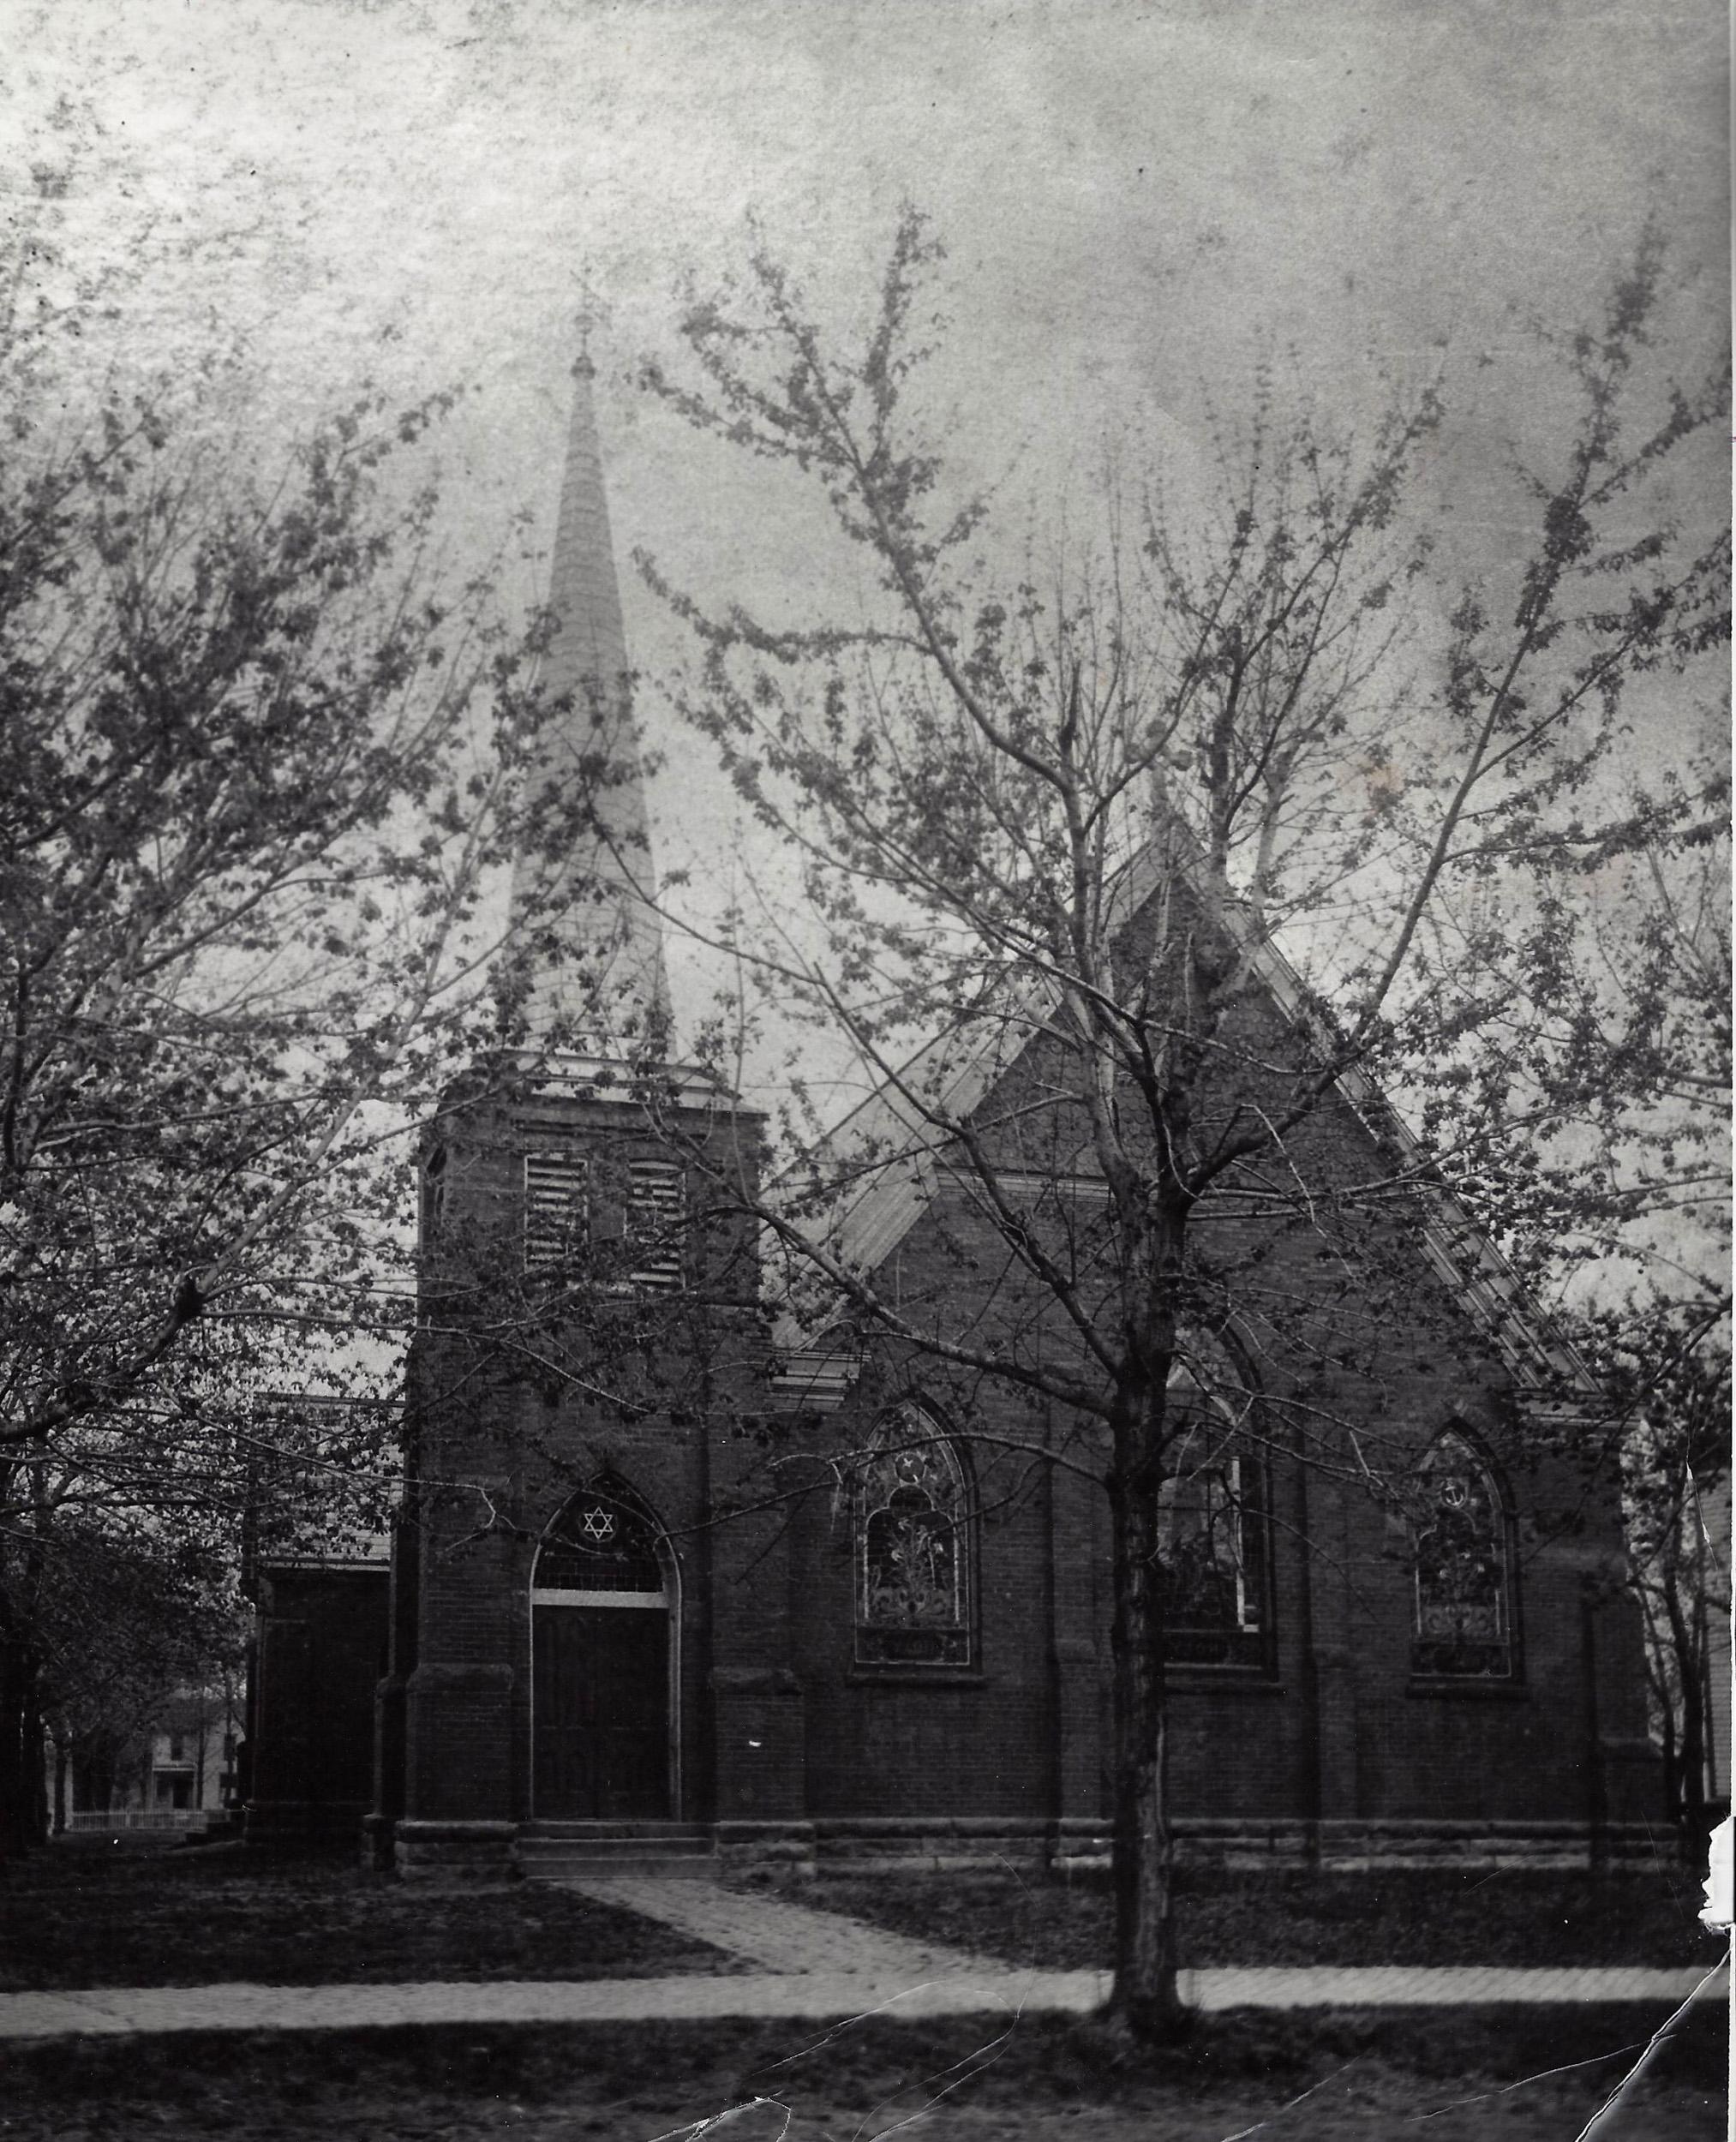 St. Paul's, Clinton